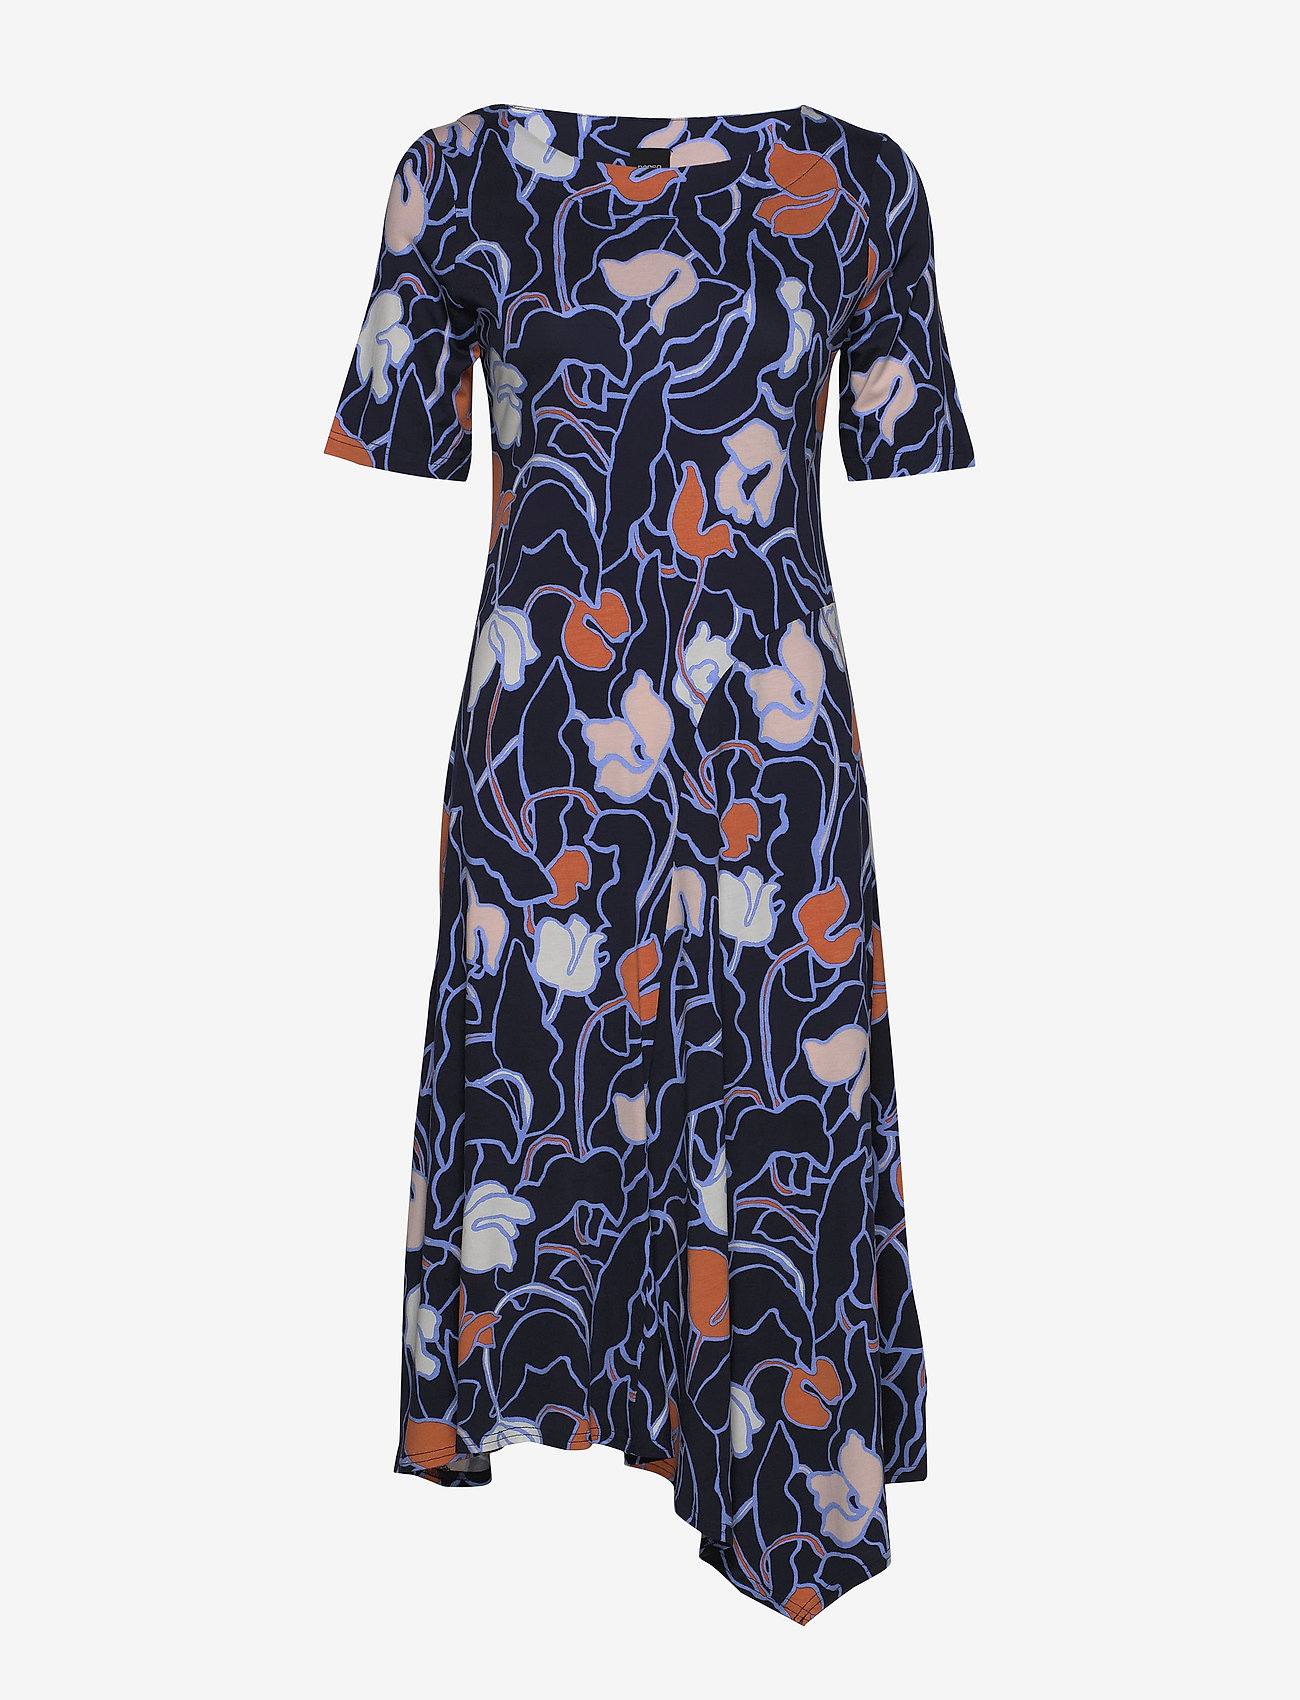 Nanso - Ladies dress, Iiris - robes midi - dark blue - 0